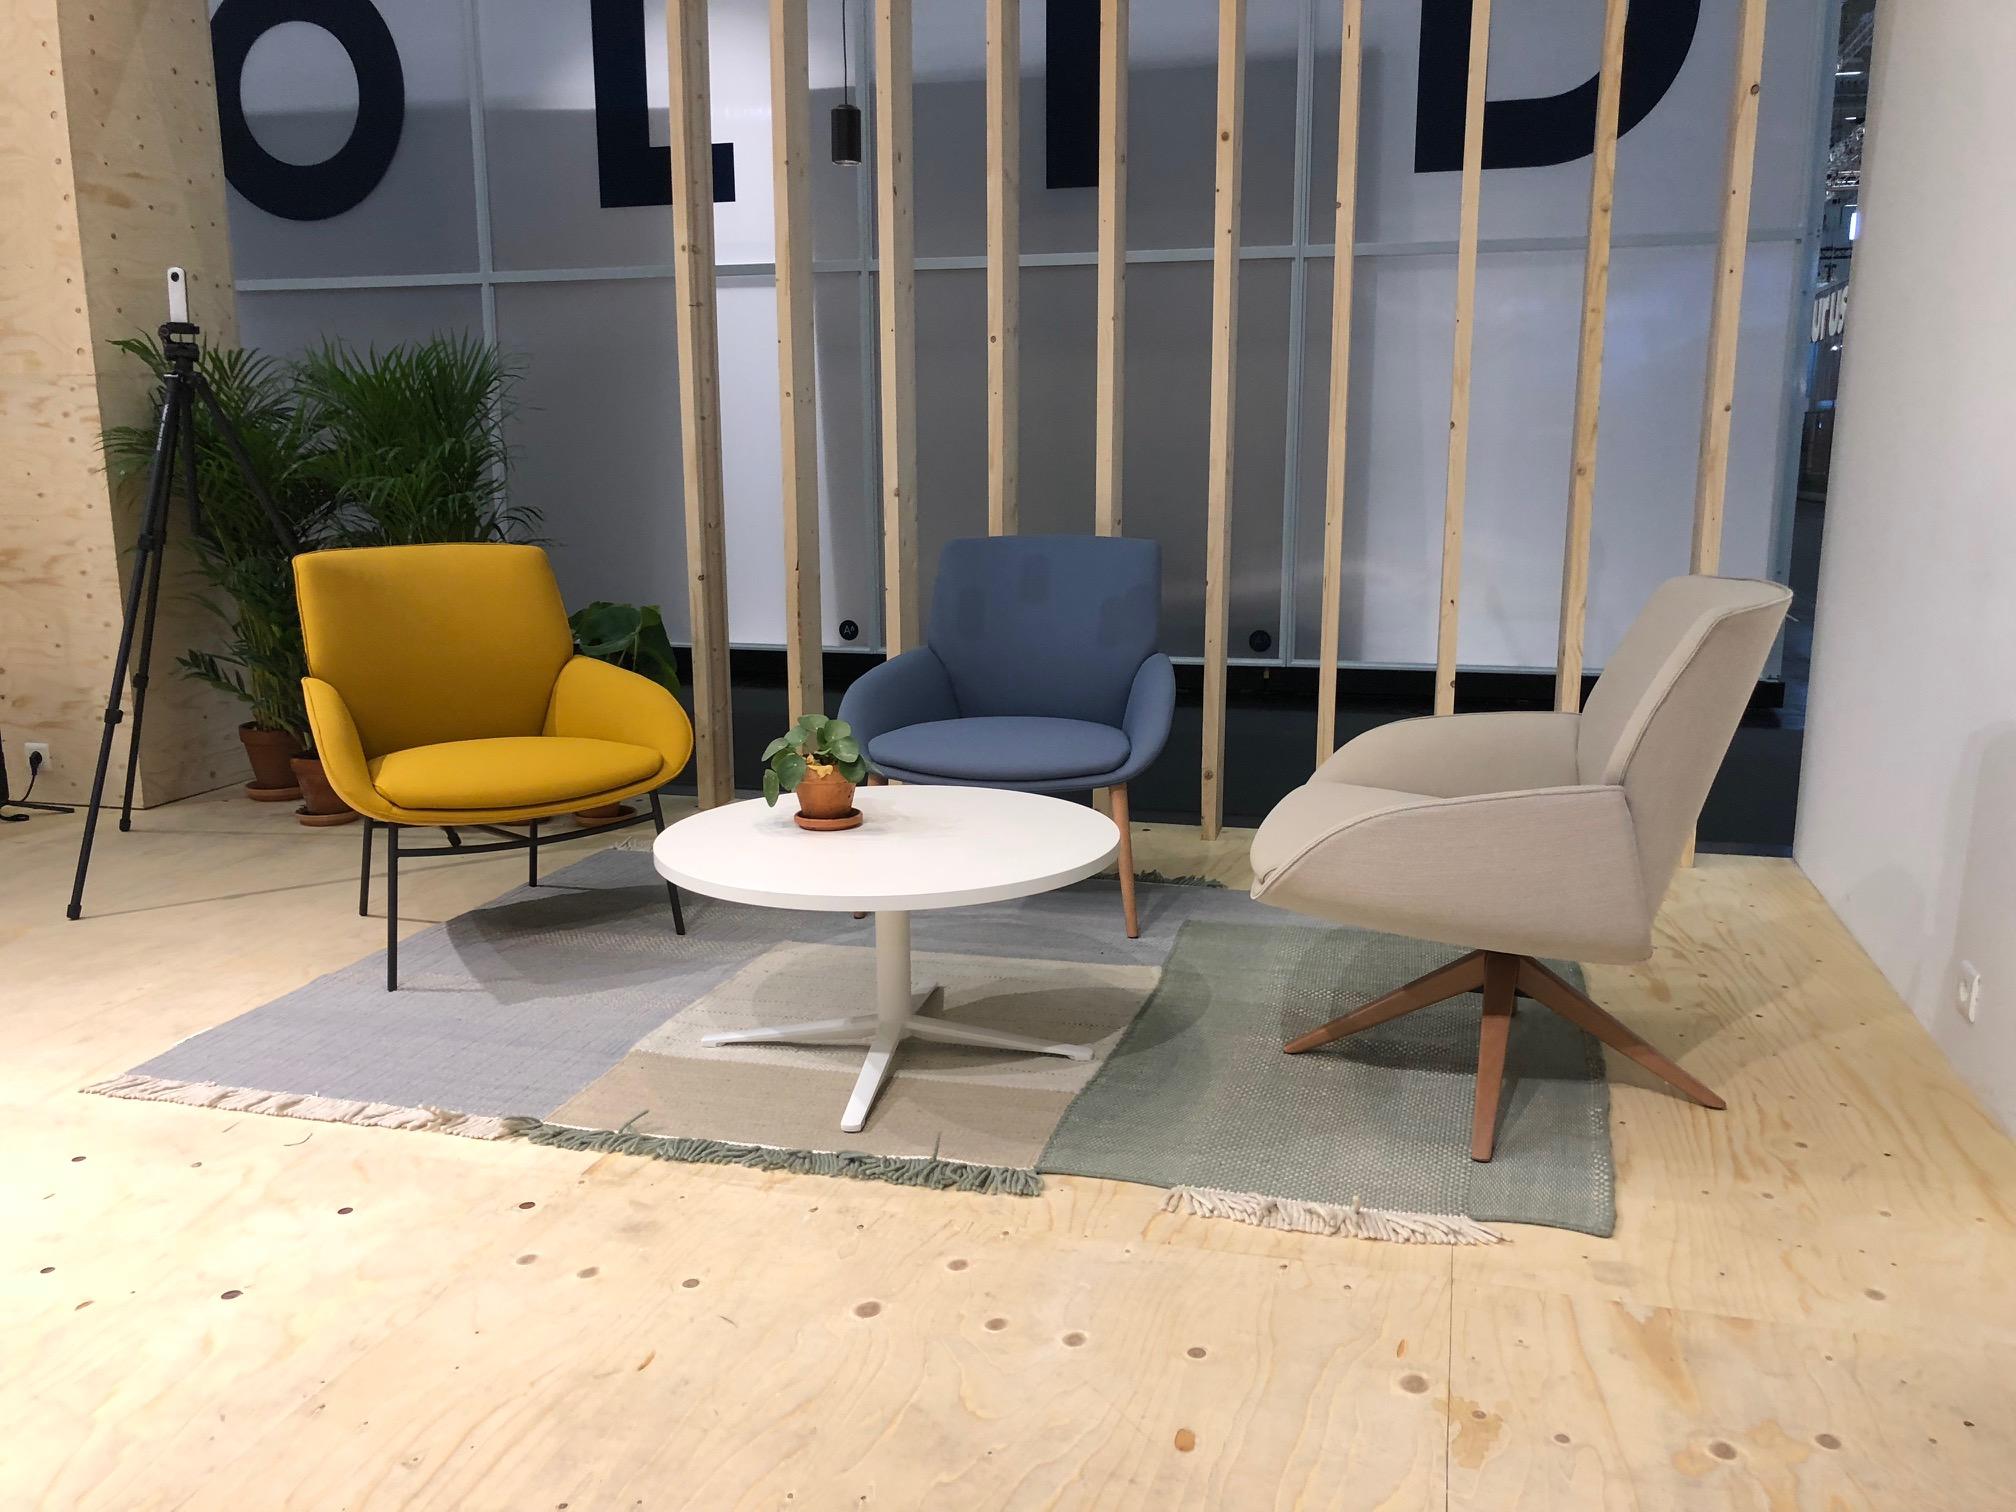 workplace furniture for sydney melbourne workspaces tcw rh t c w com au High Top Tables Office Furniture High Top Tables Office Furniture